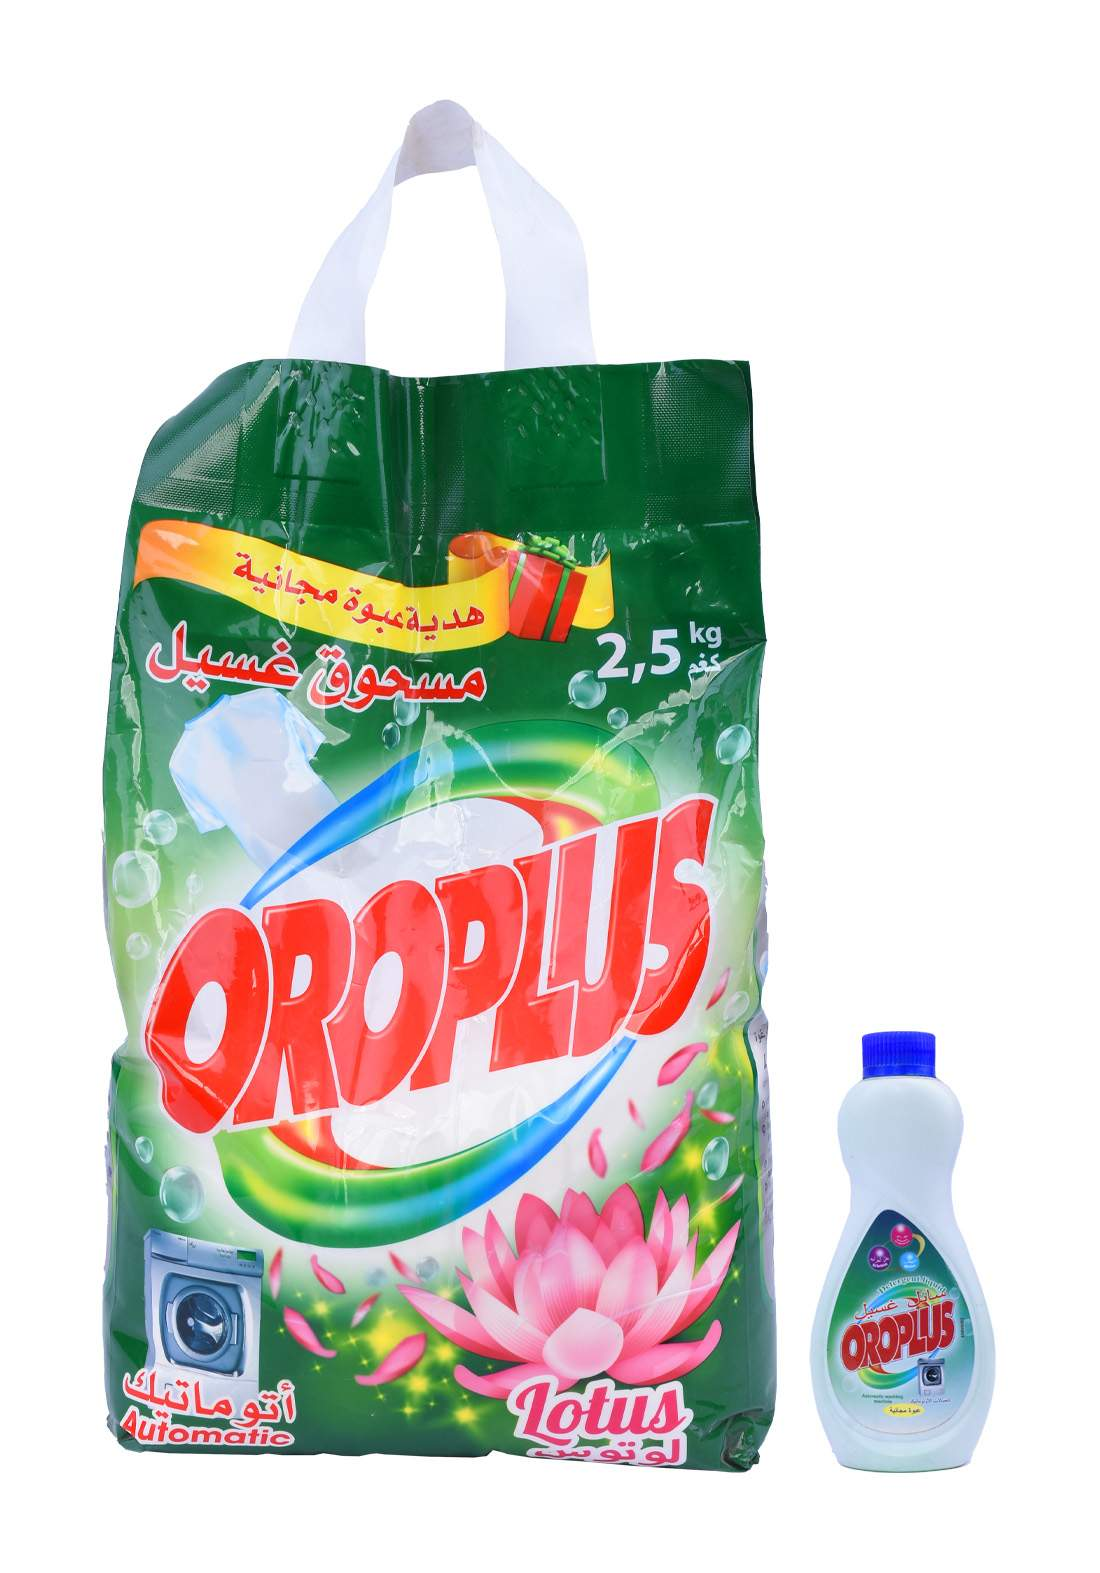 Oroplus Washing Powder Lotus  2.5 Kg    مسحوق غسيل الملابس للغسالات الاوتماتيكية مع عبوة هدية